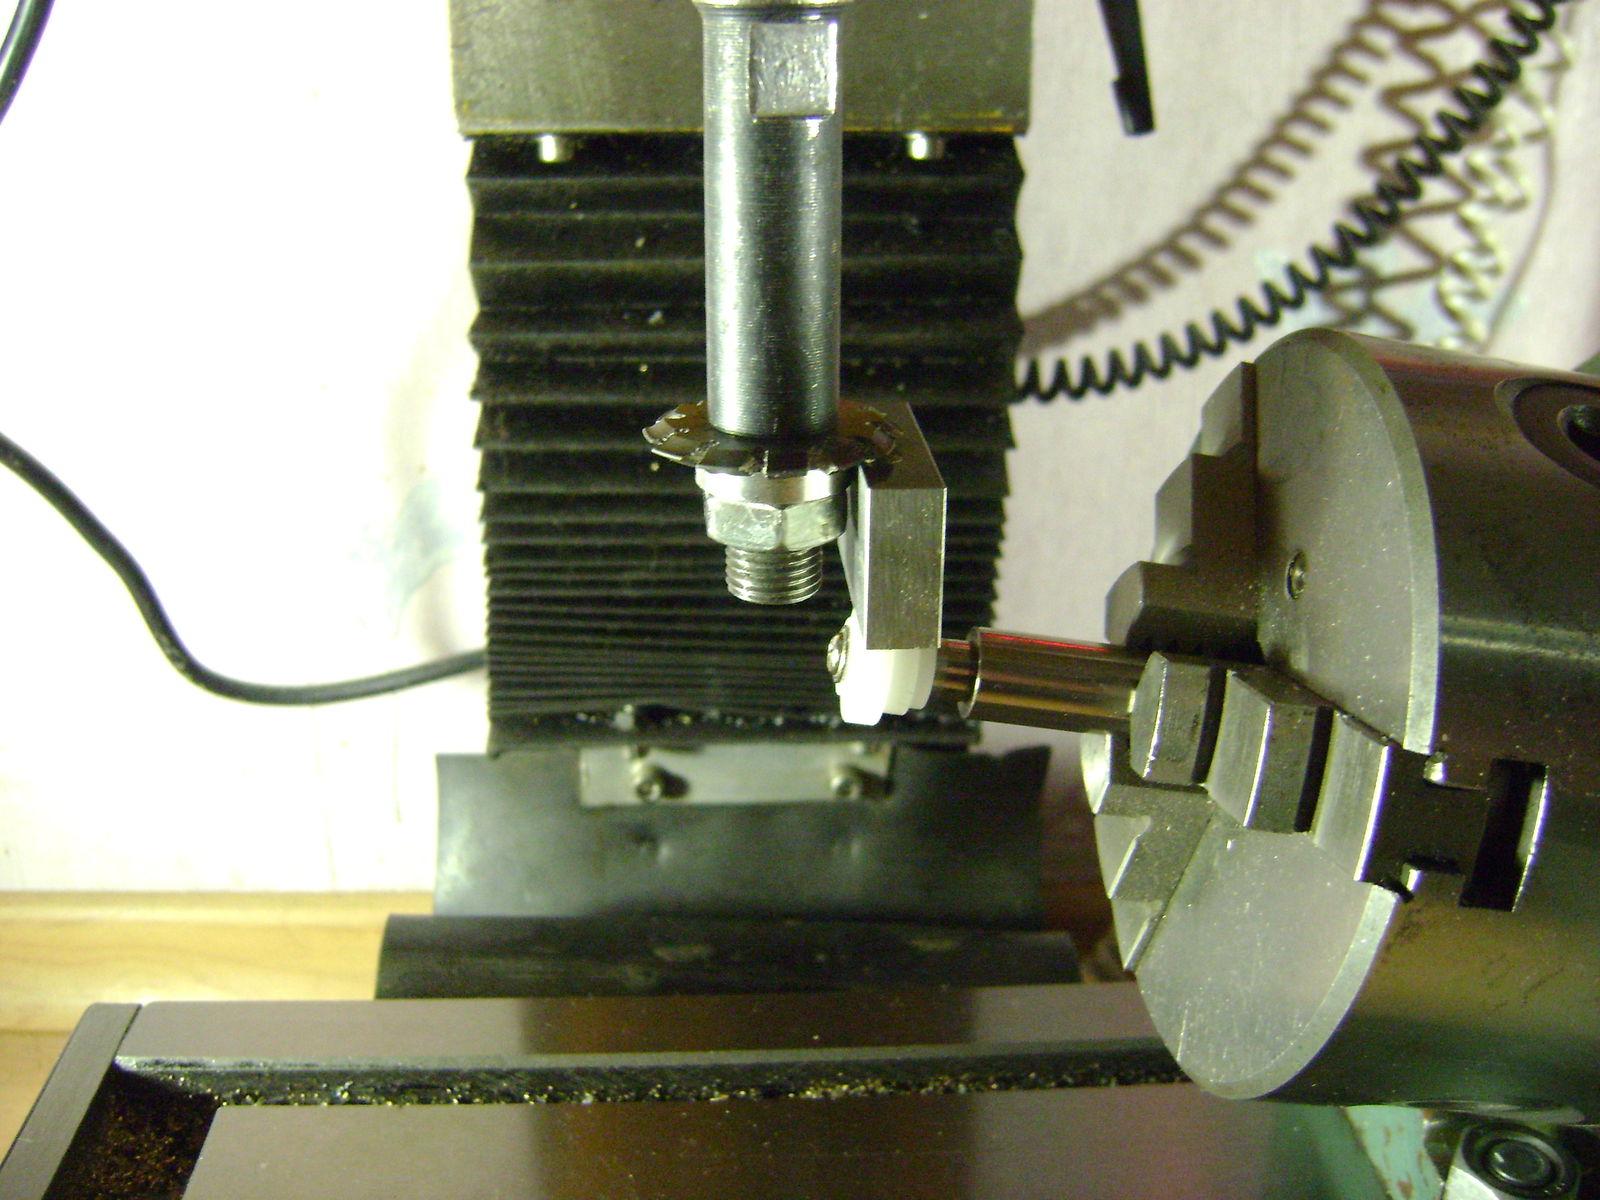 Снова шестеренки, но уже для ксерокса.....        m0,6 z=26 угол 9° (материал - полиацеталь, POМ)